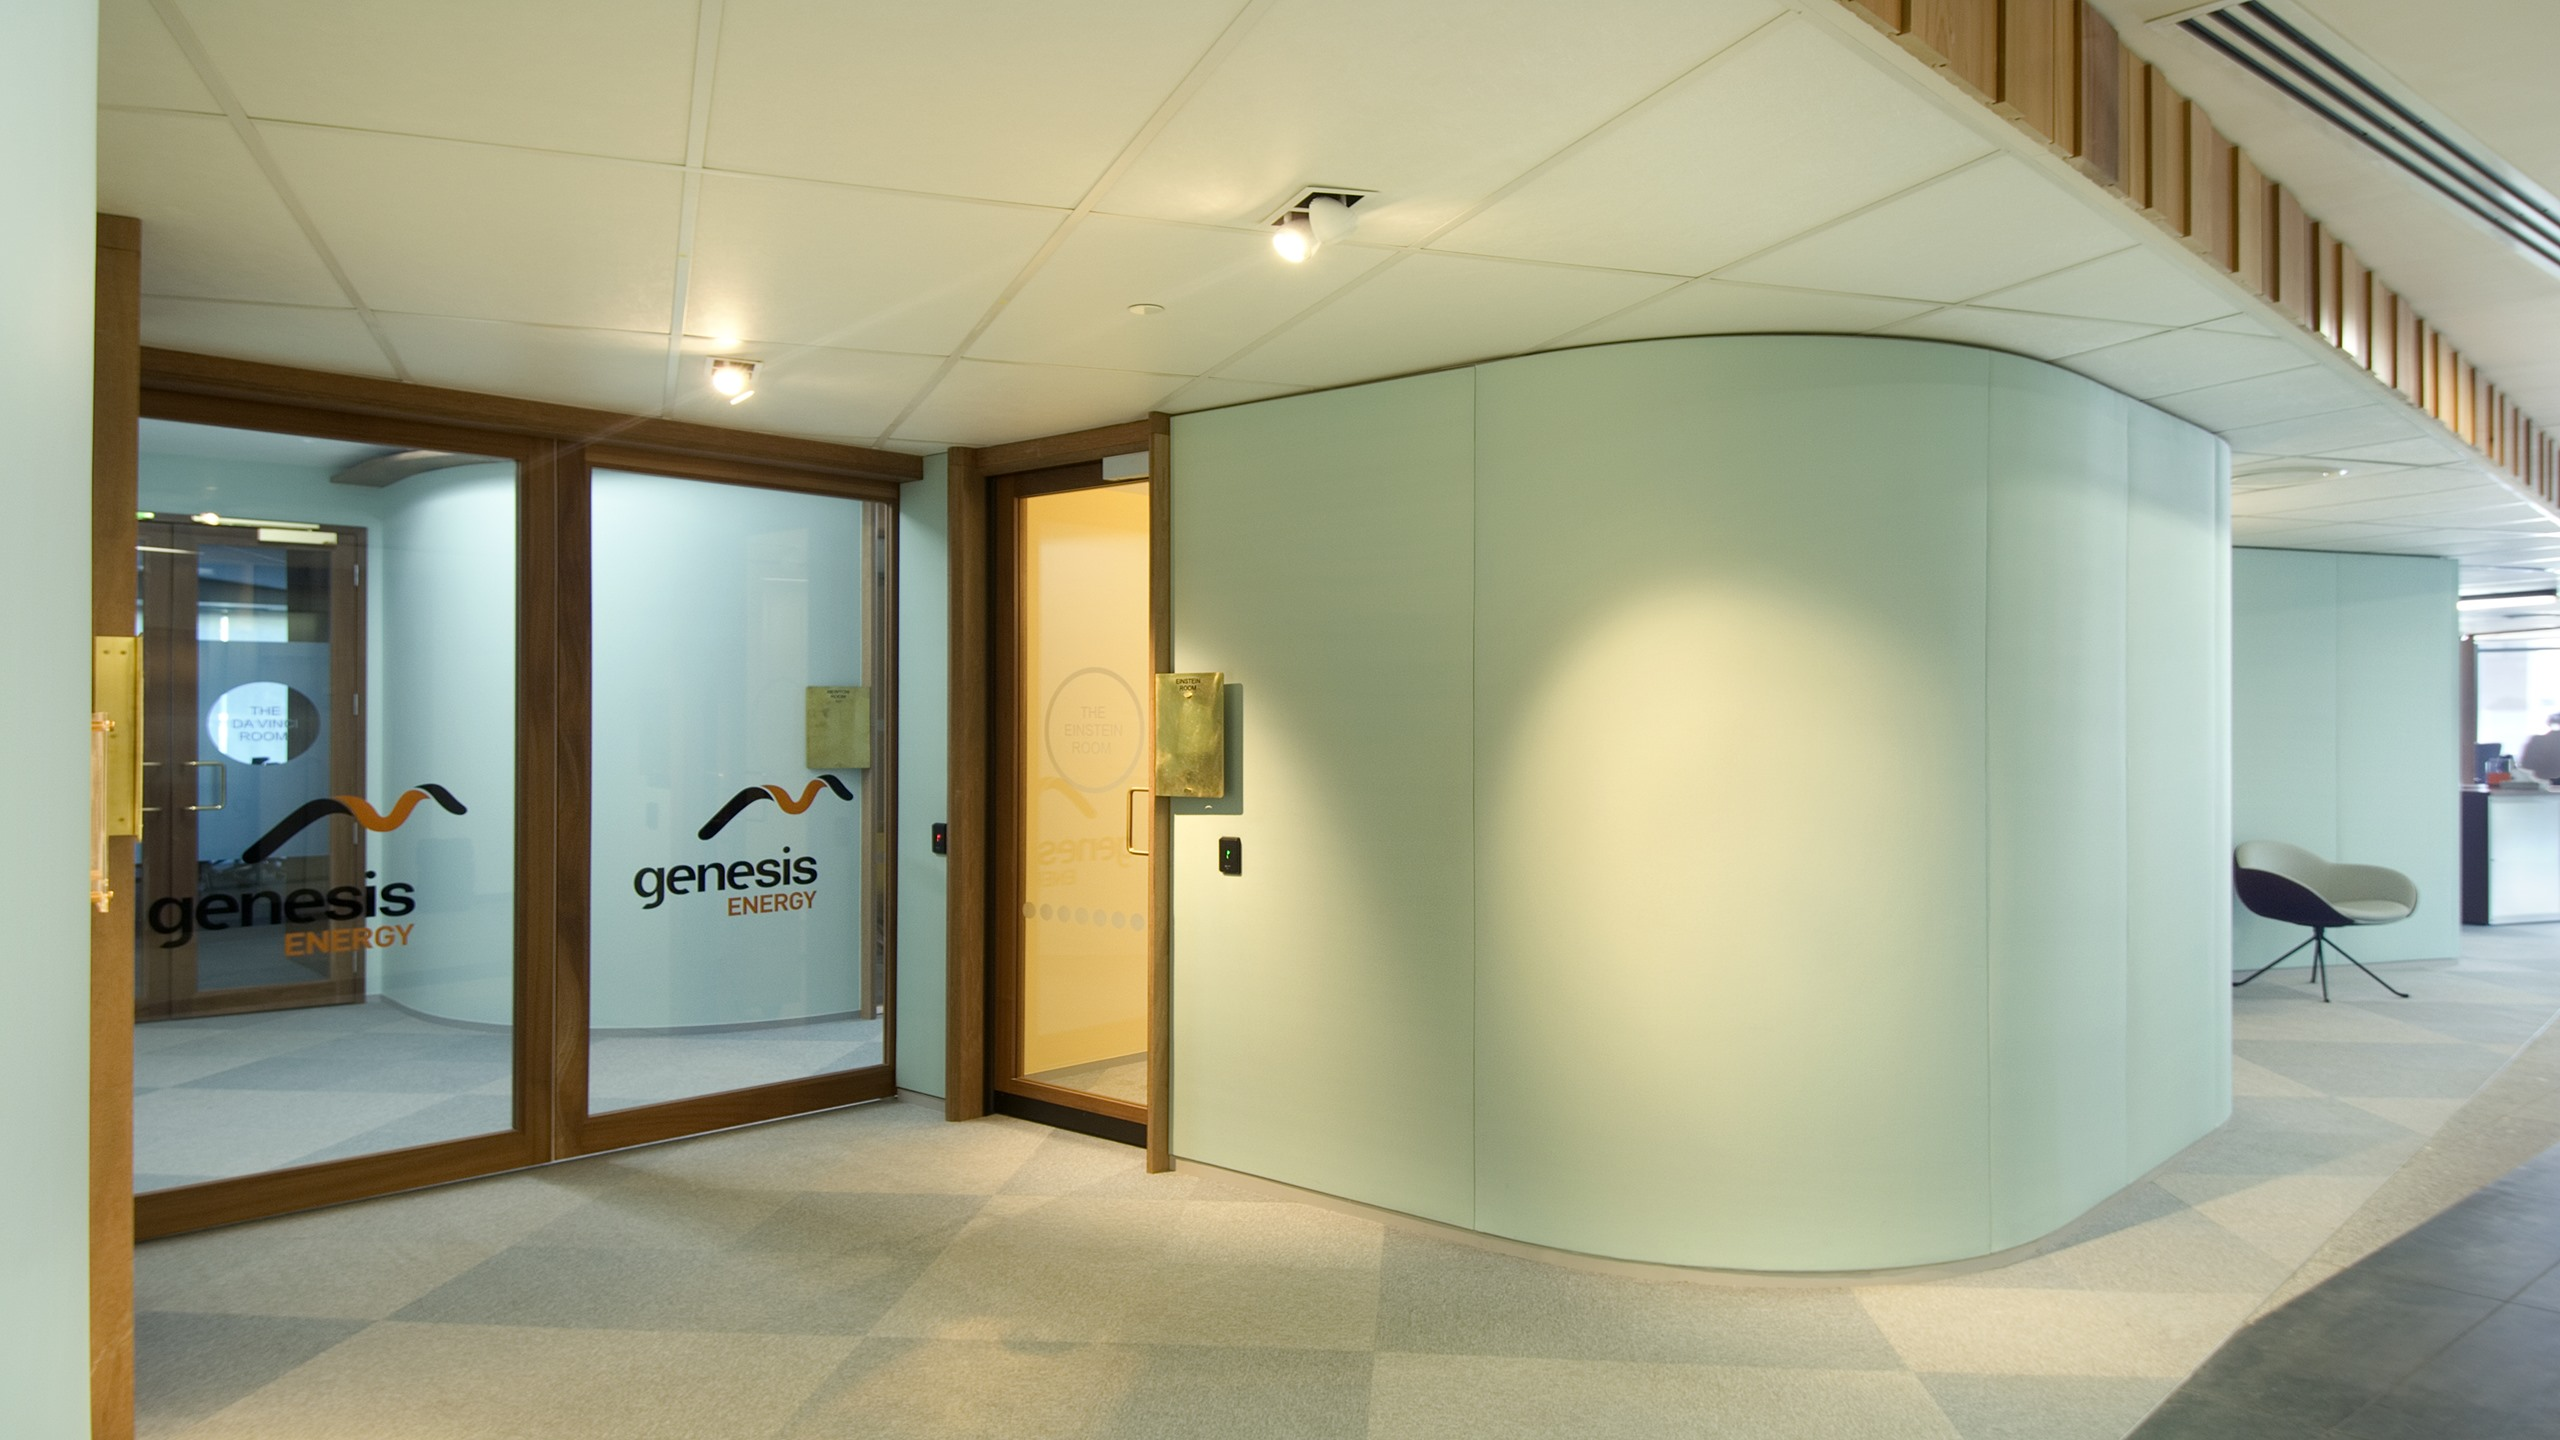 Genesis Energy - Curved Snaptex Walls